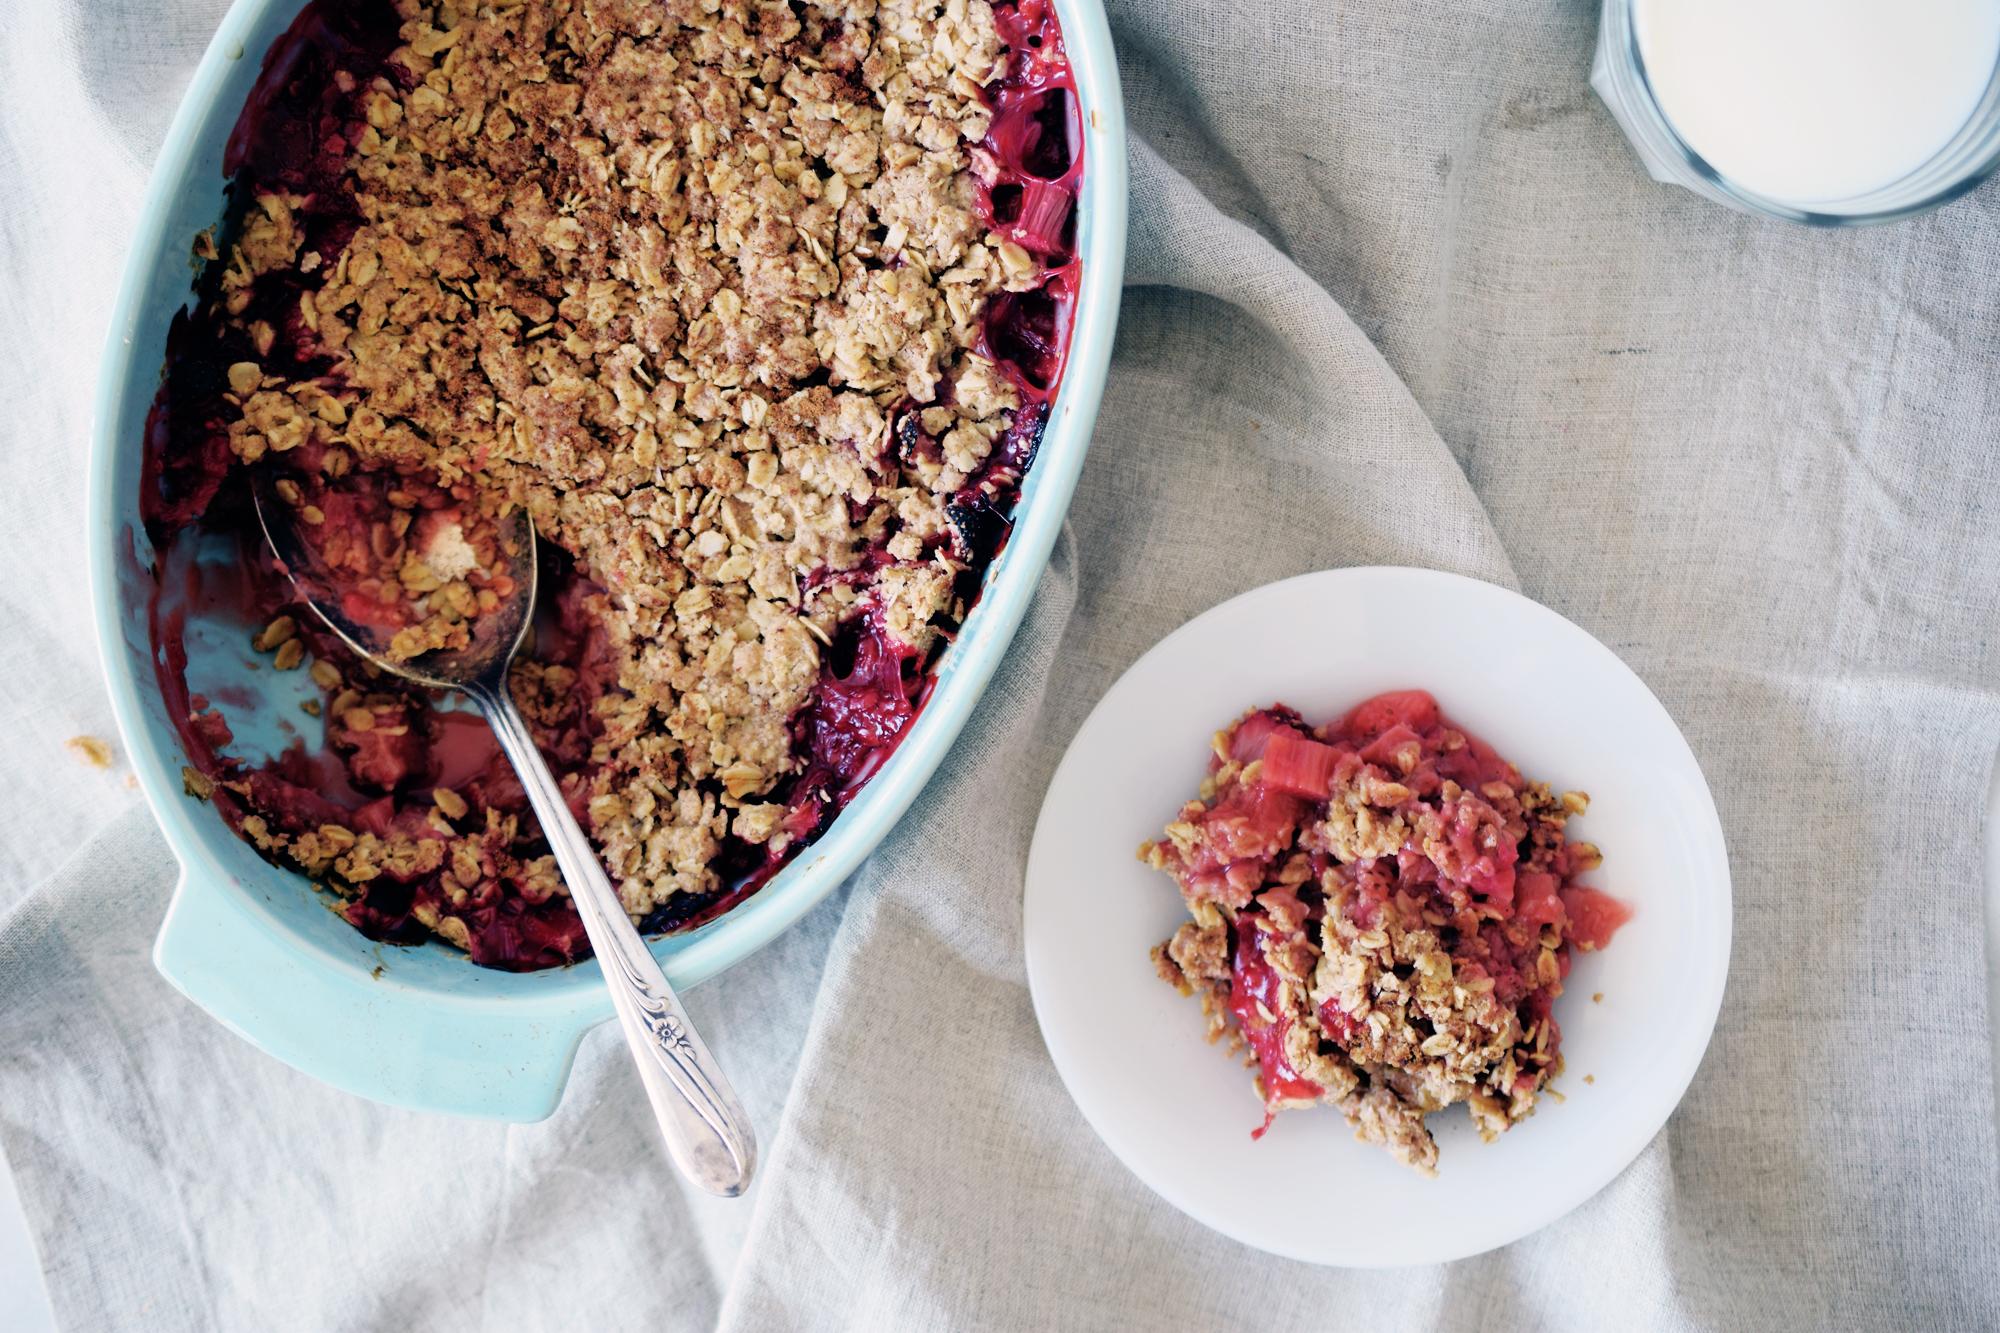 Strawberry Rhubarb Crumble Recipe